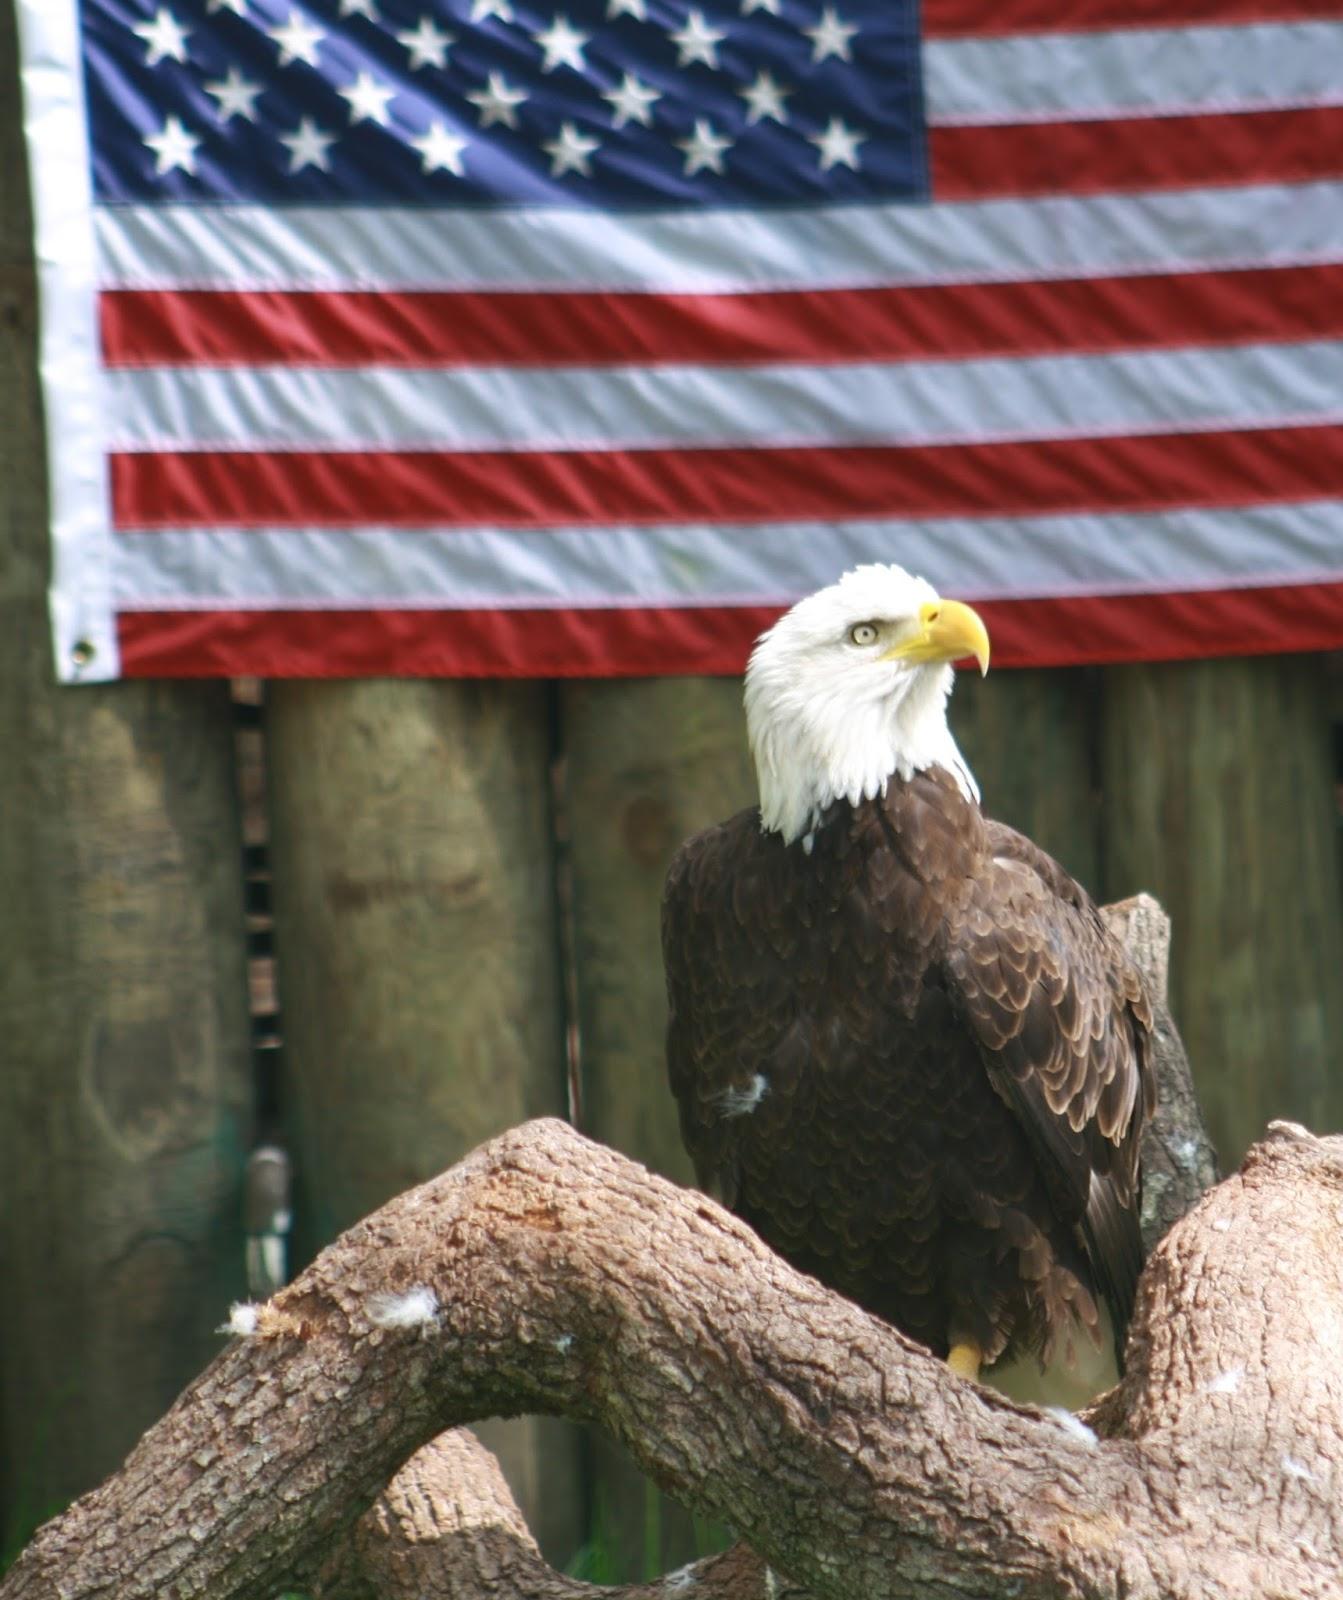 Bald eagle the American national emblem.